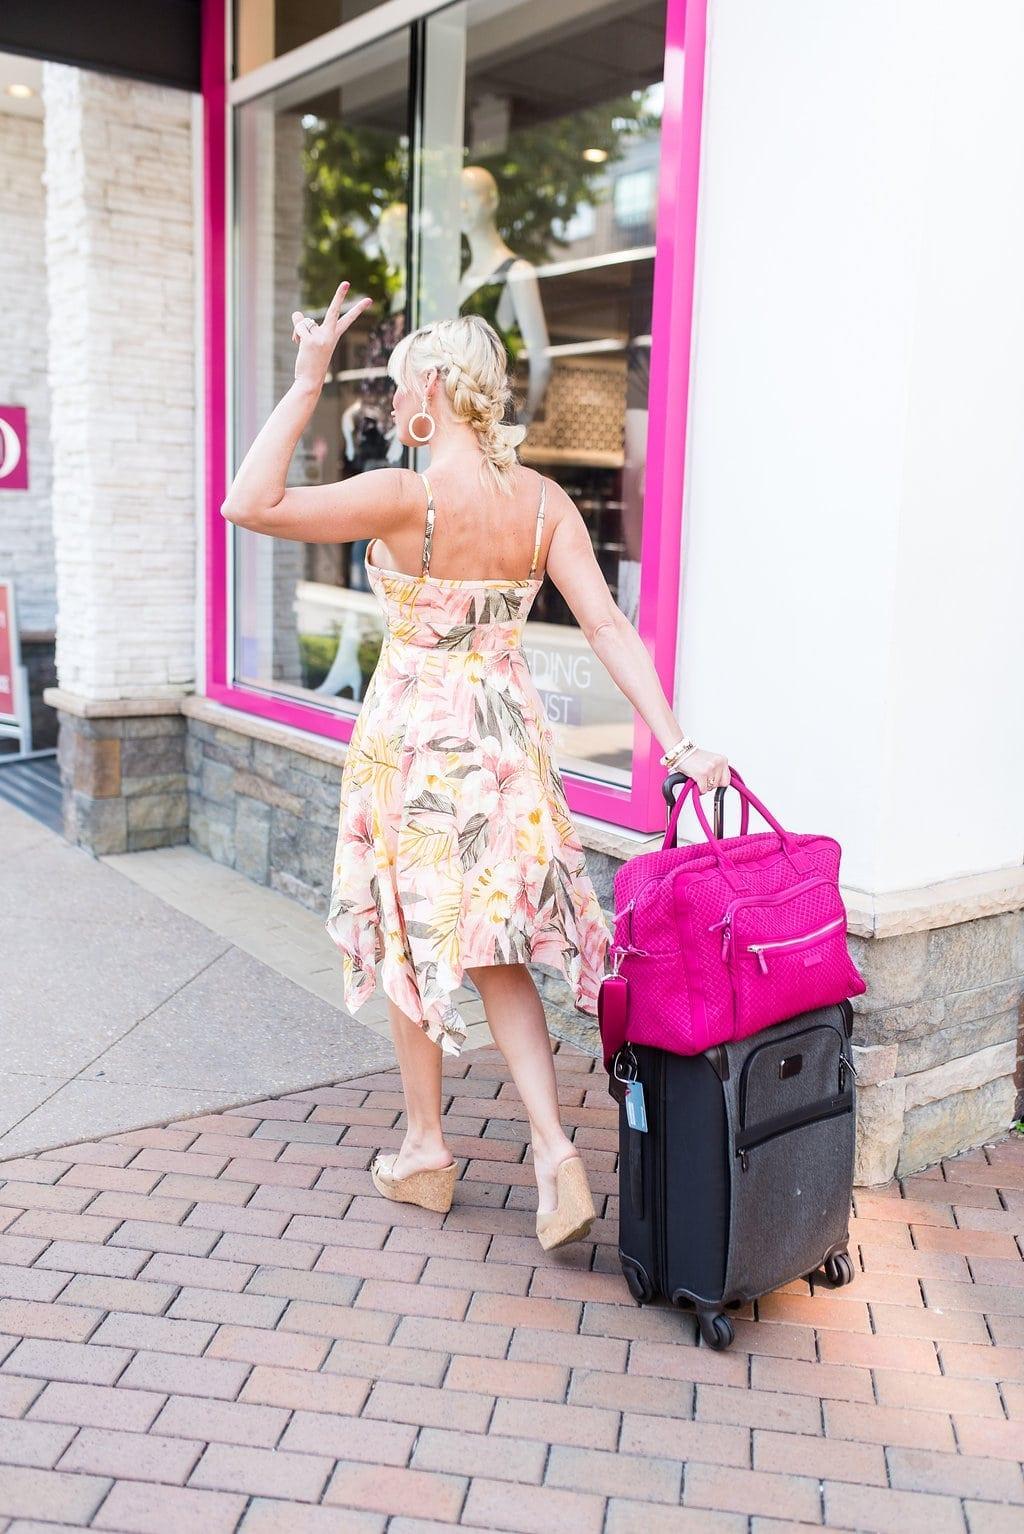 Vera Bradley Luggage and floral midi dress with braid hair updo.